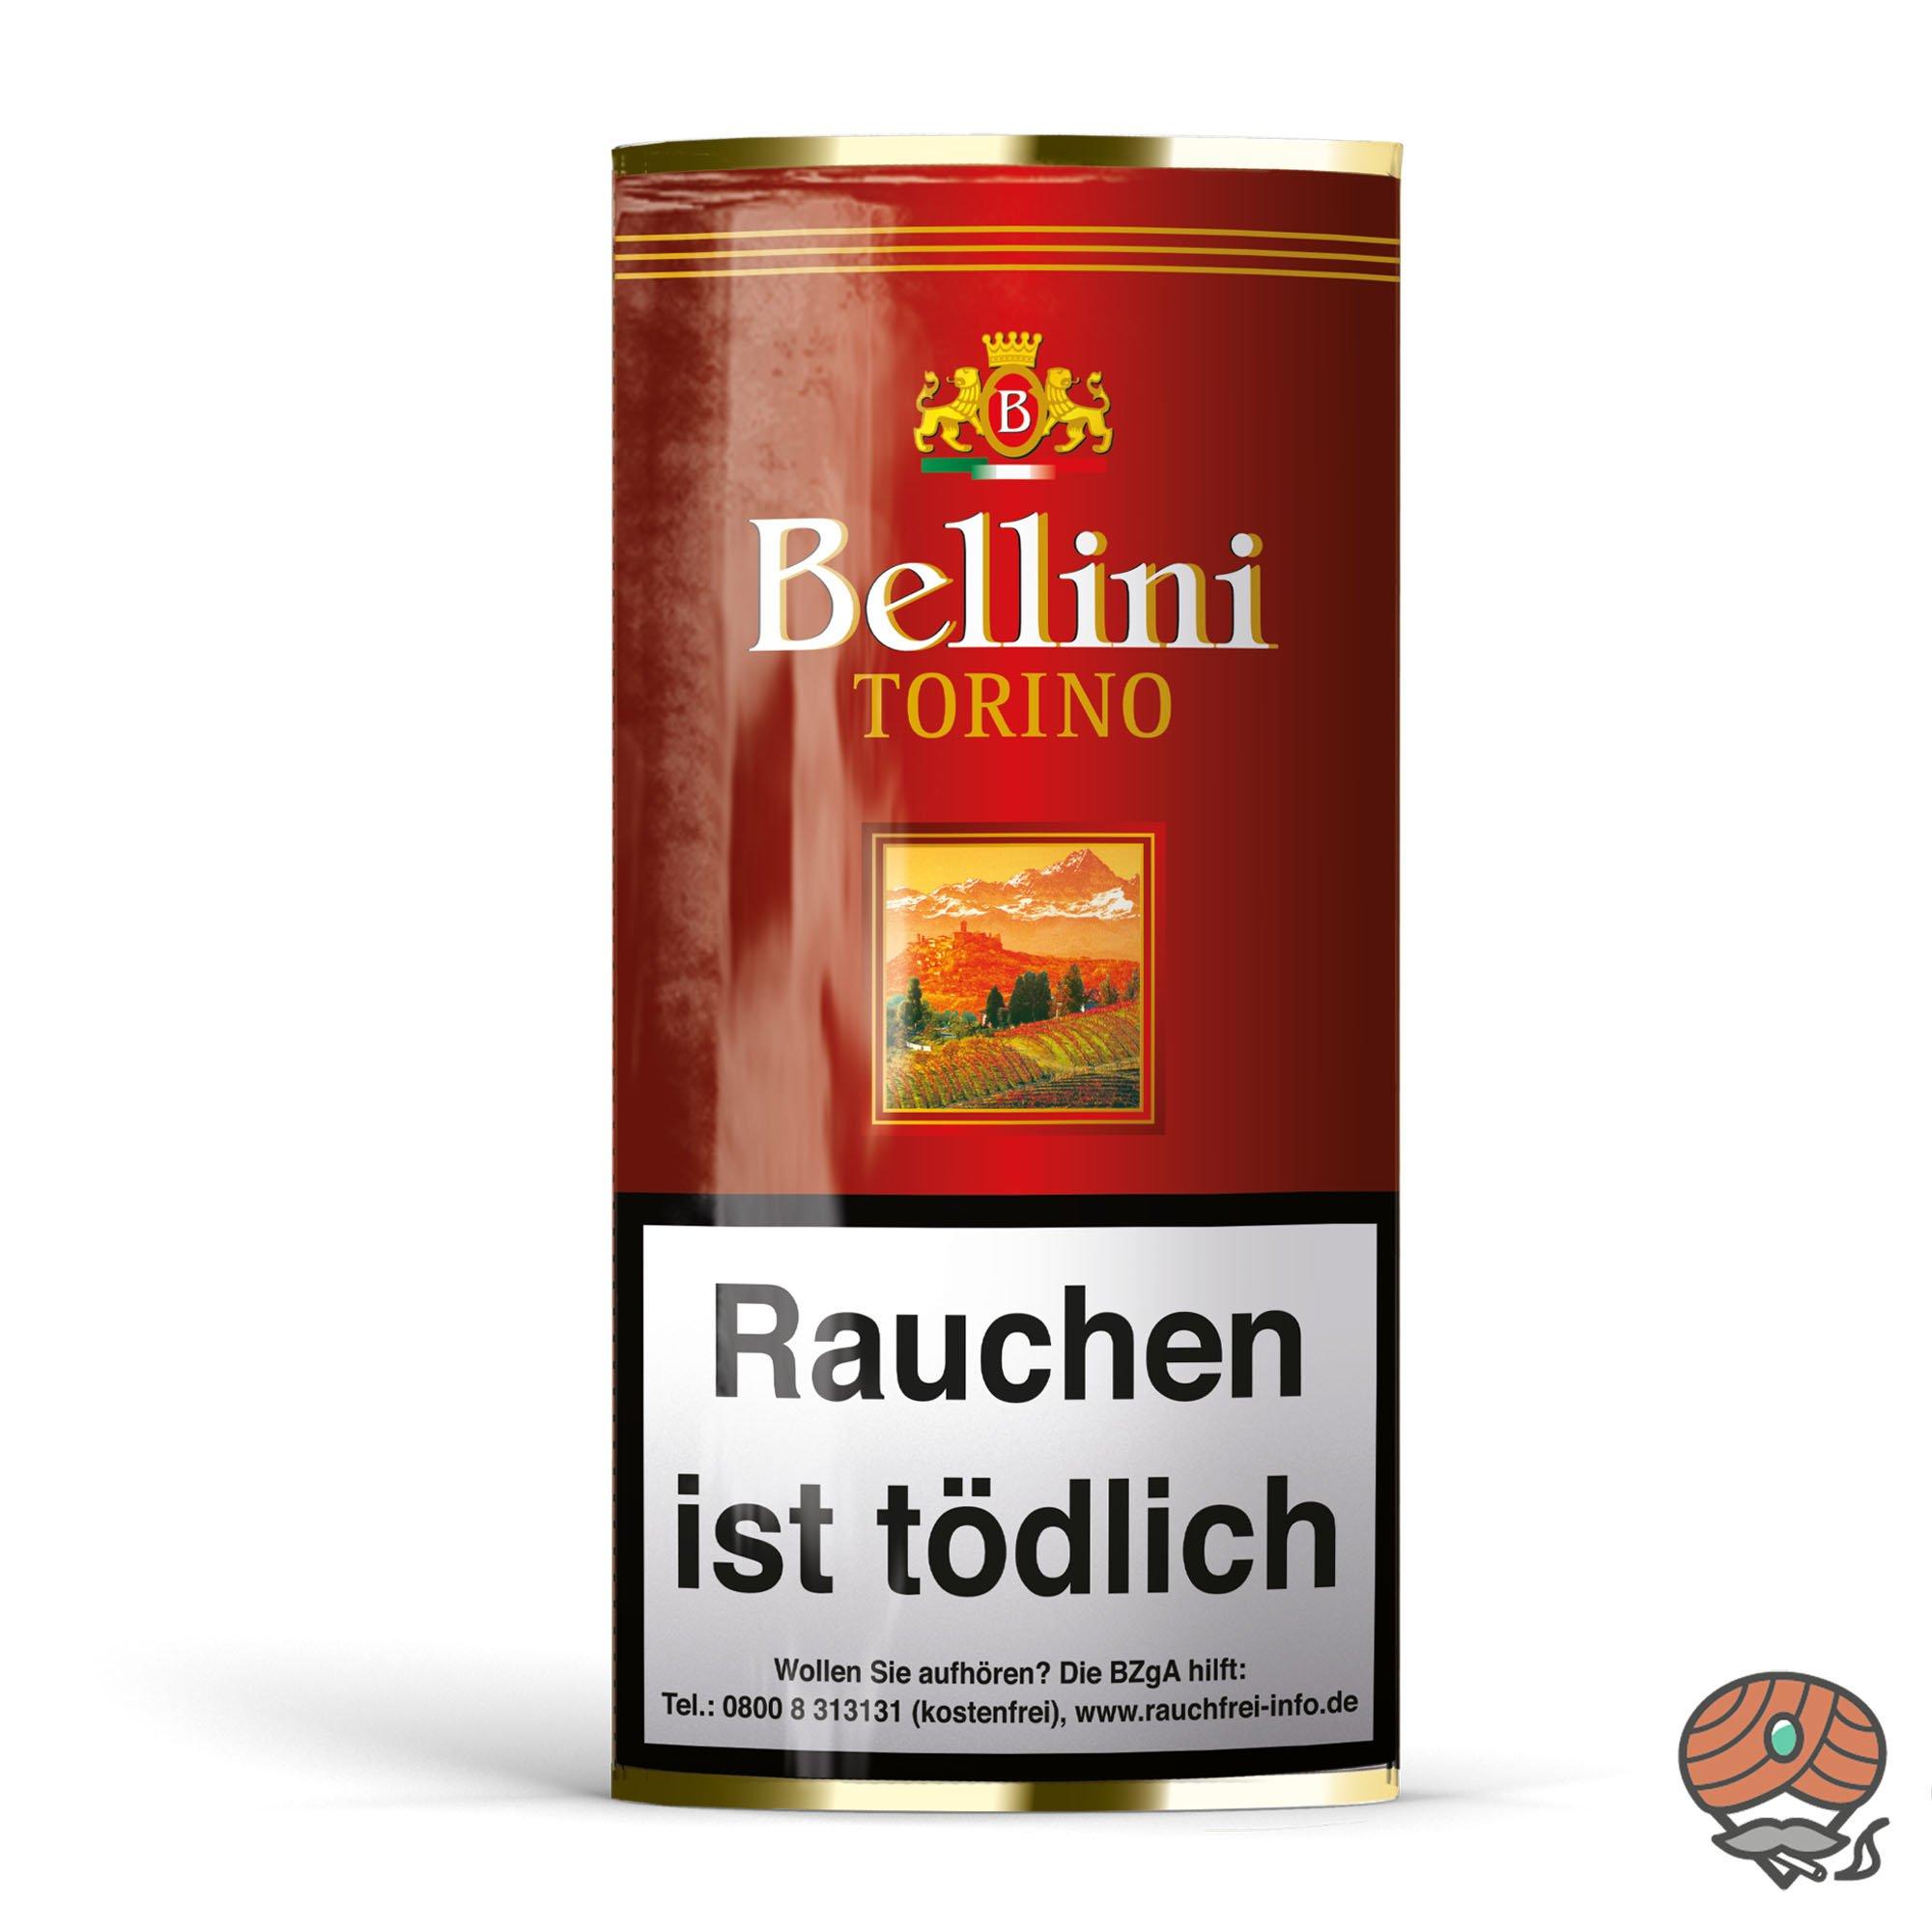 Bellini Torino Pfeifentabak 50g Pouch